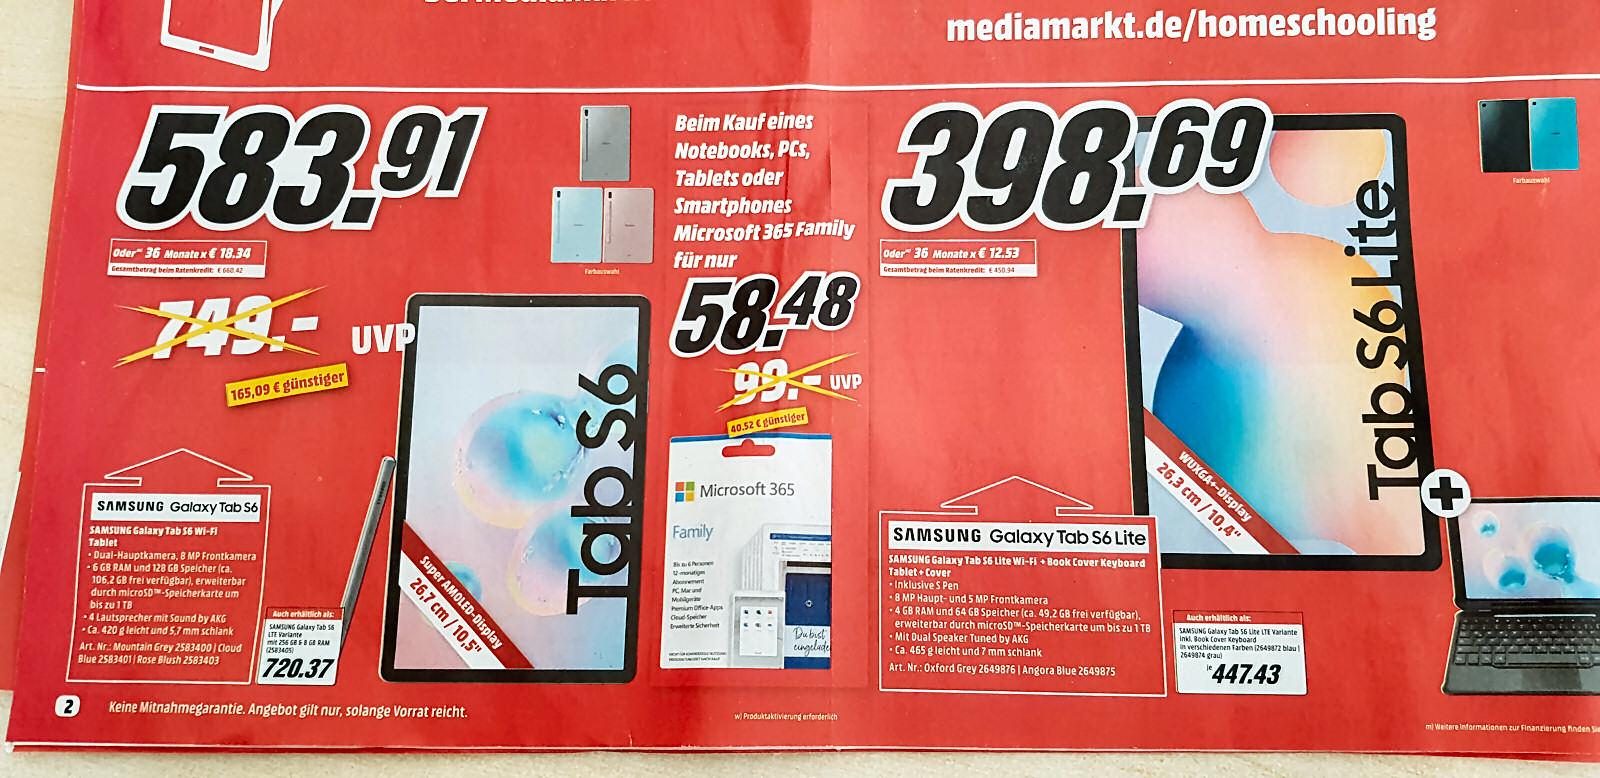 Samsung Galaxy TAB S6 WiFi 128 GB